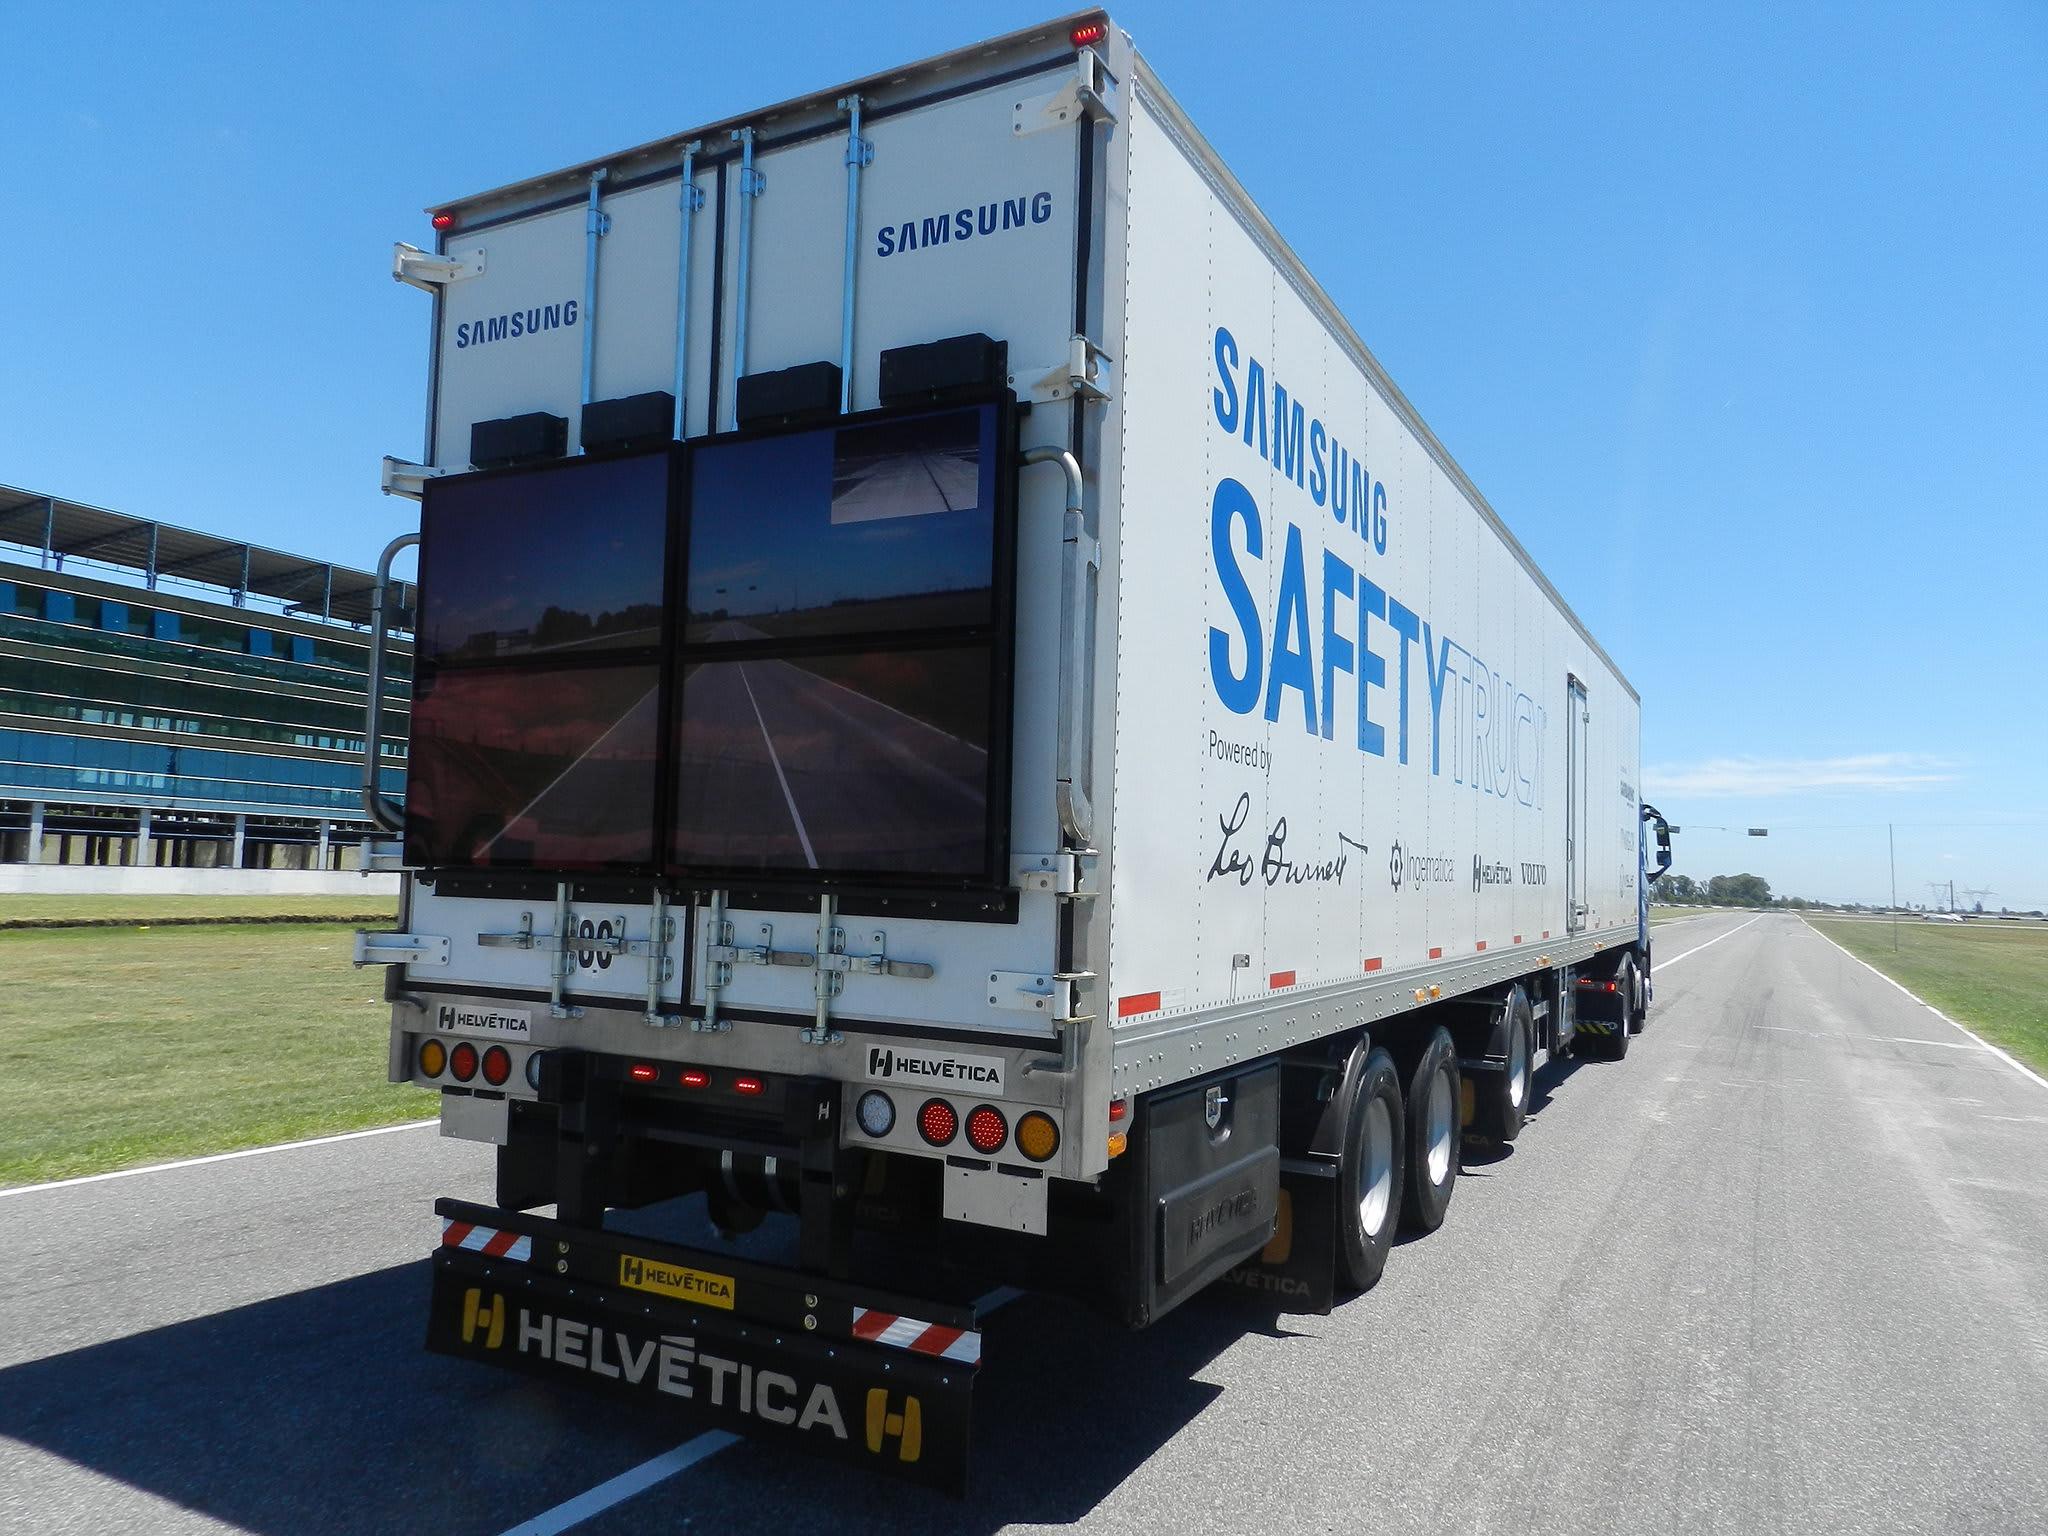 Samsung S Safety Truck Concept Starts Testing In Argentina